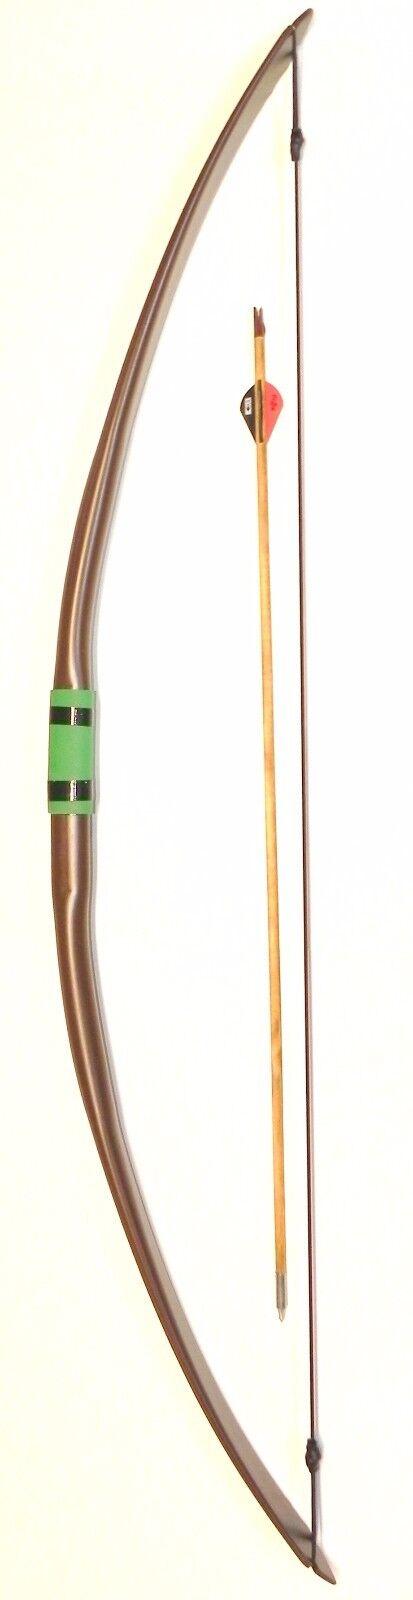 Arco de tiro con arco,  la tortuga escozor  51in-30+lb arco largo, Envío Gratis